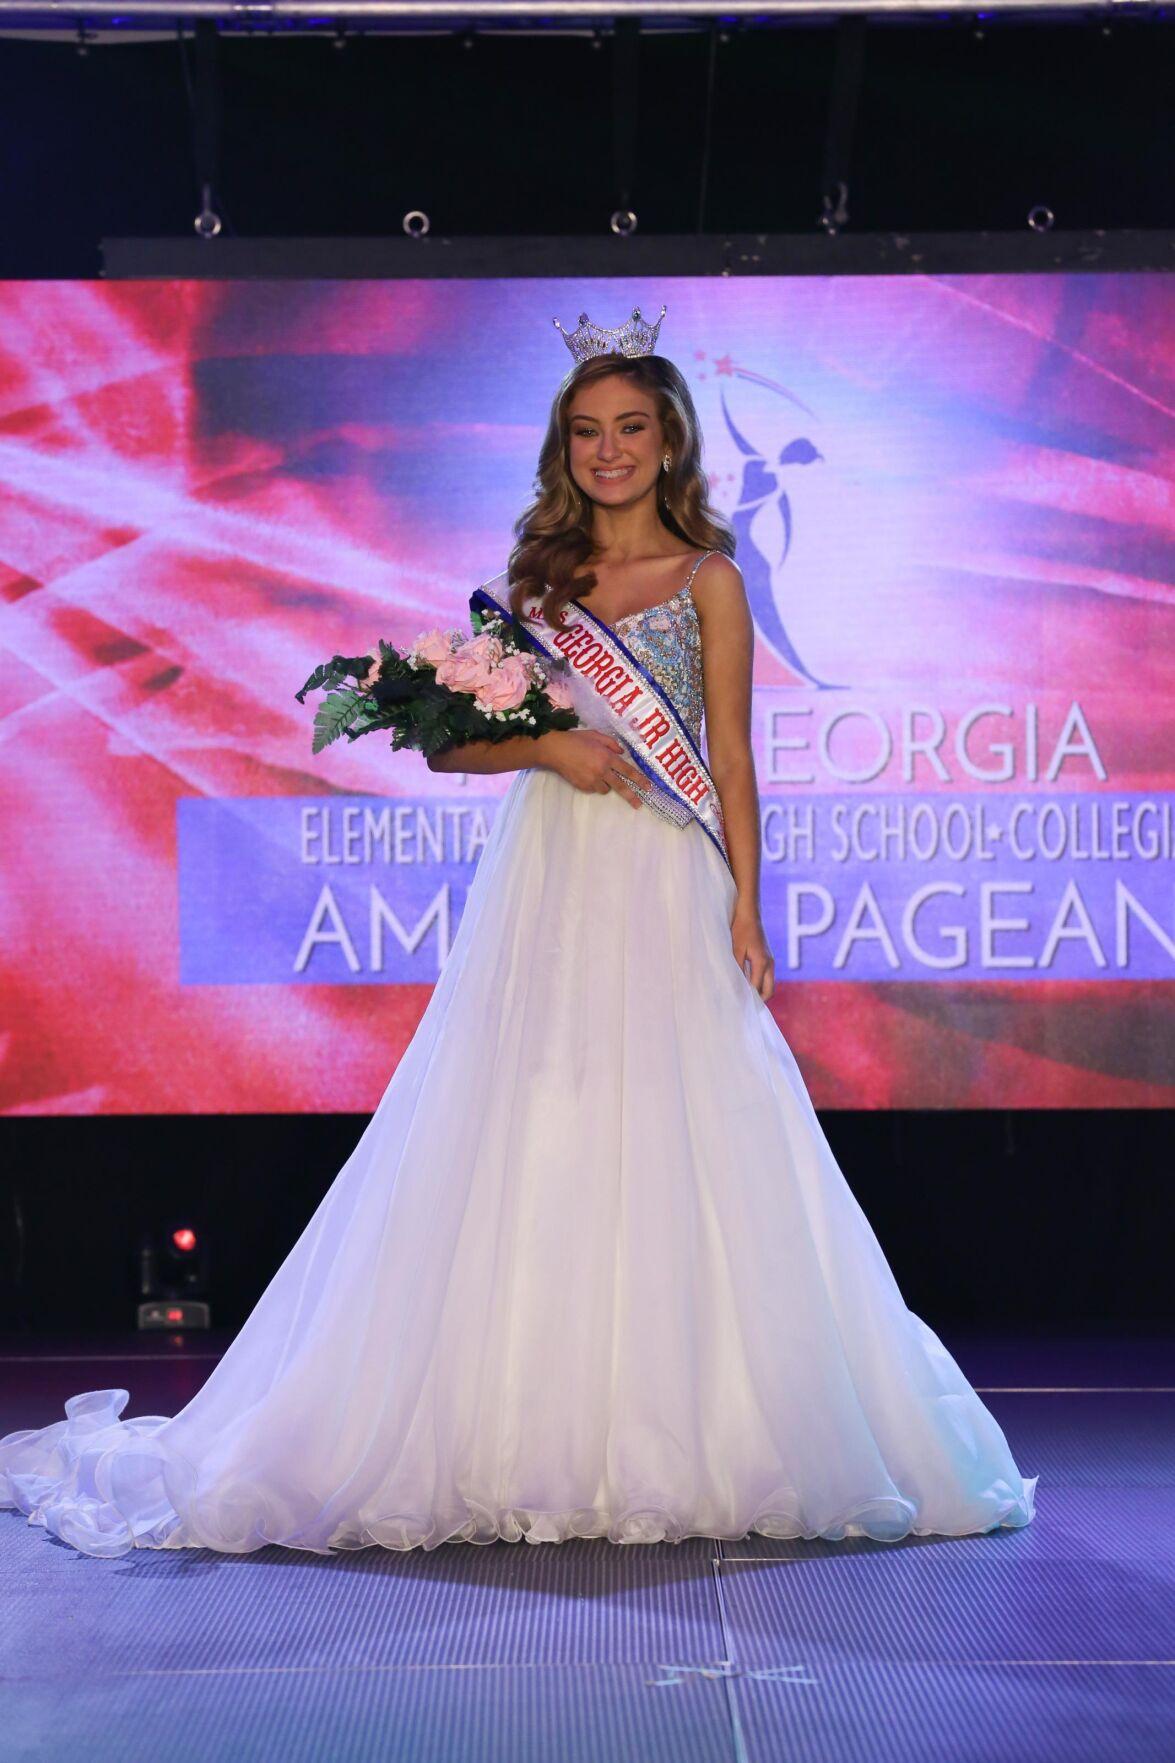 Valdosta girls win state pageant titles